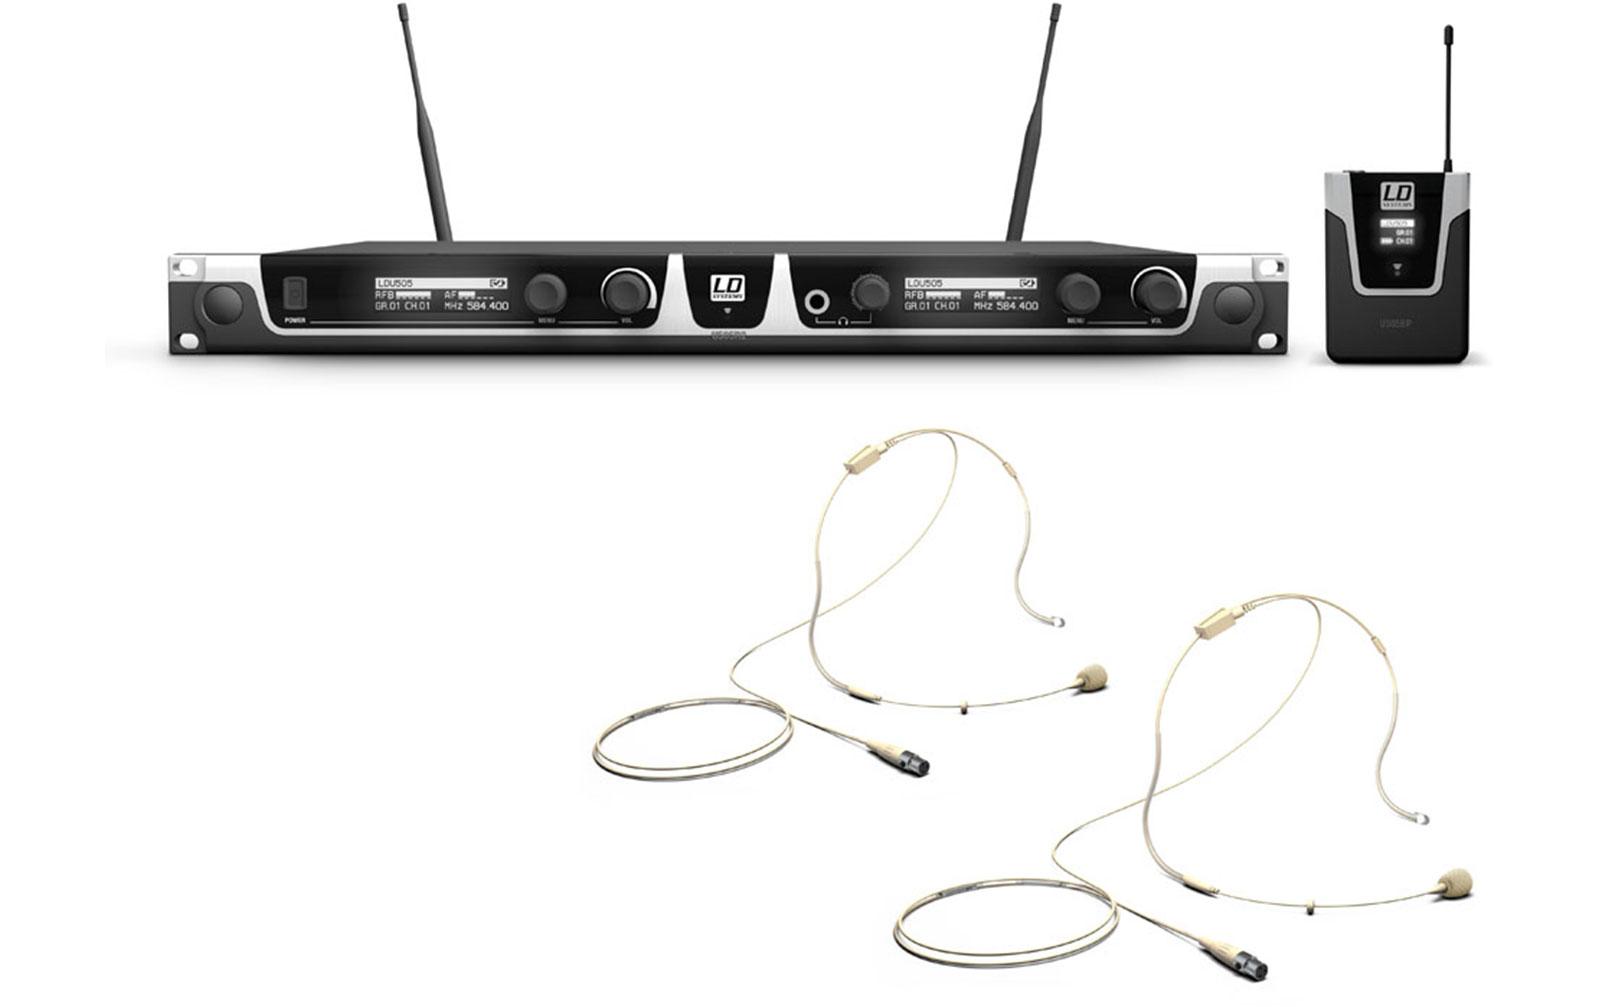 ld-systems-u505-bphh-2-funkmikrofon-system-mit-2-x-bodypack-und-2-x-headset-beigefarben